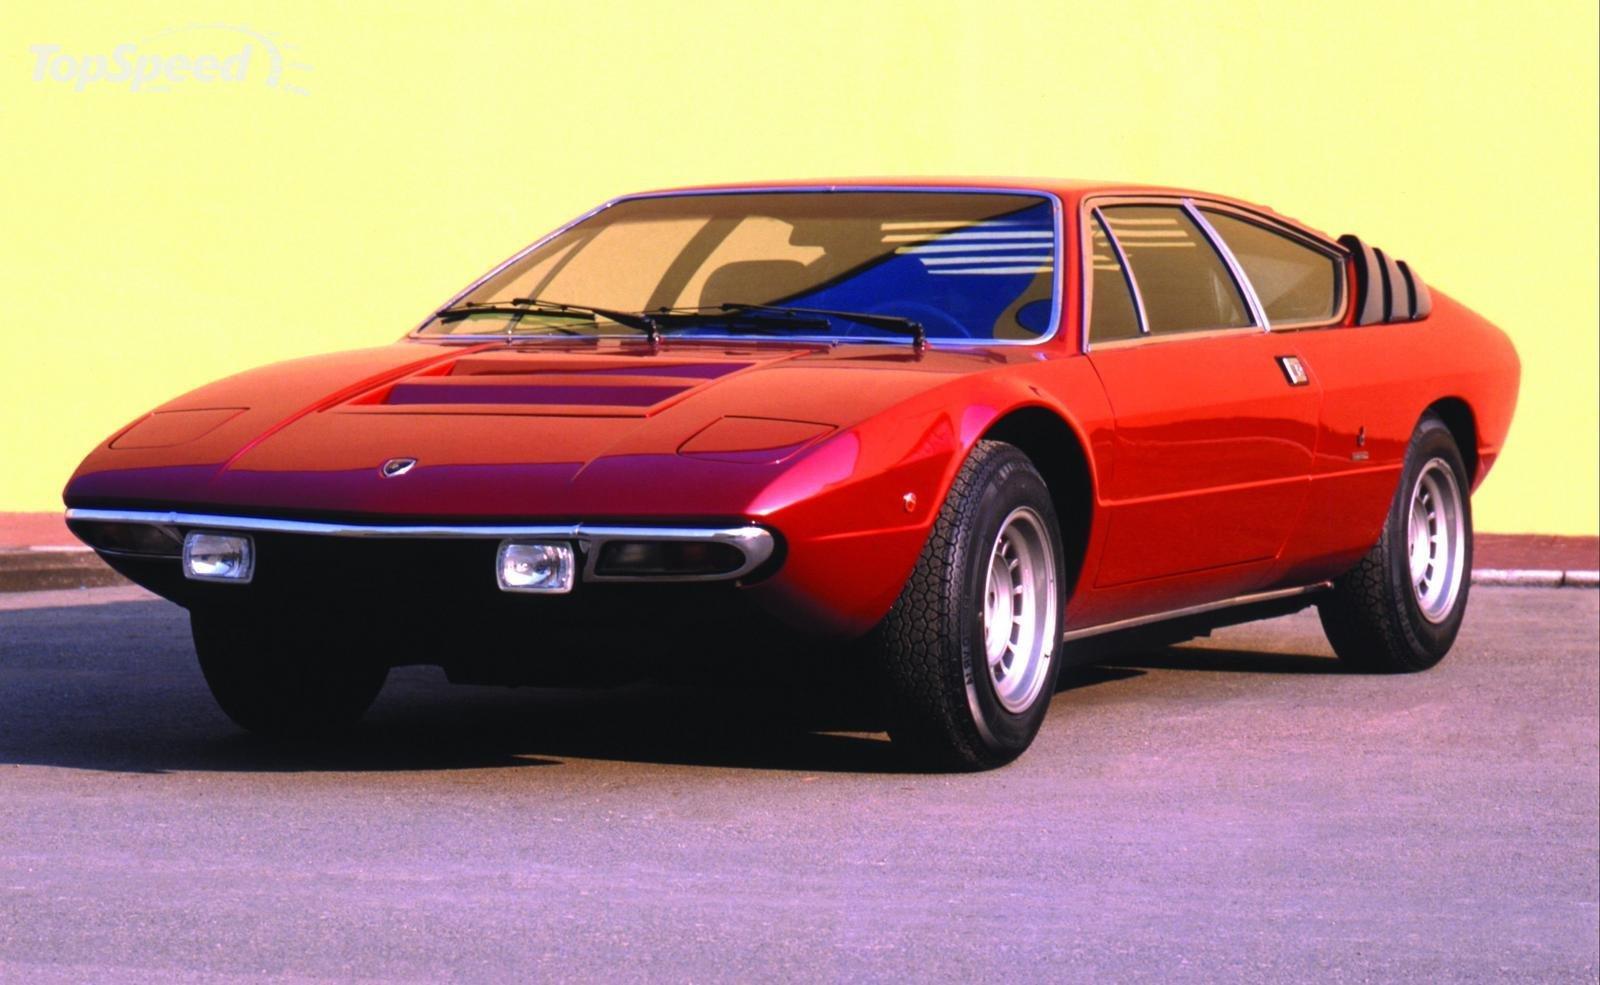 Lamborghini's experiment